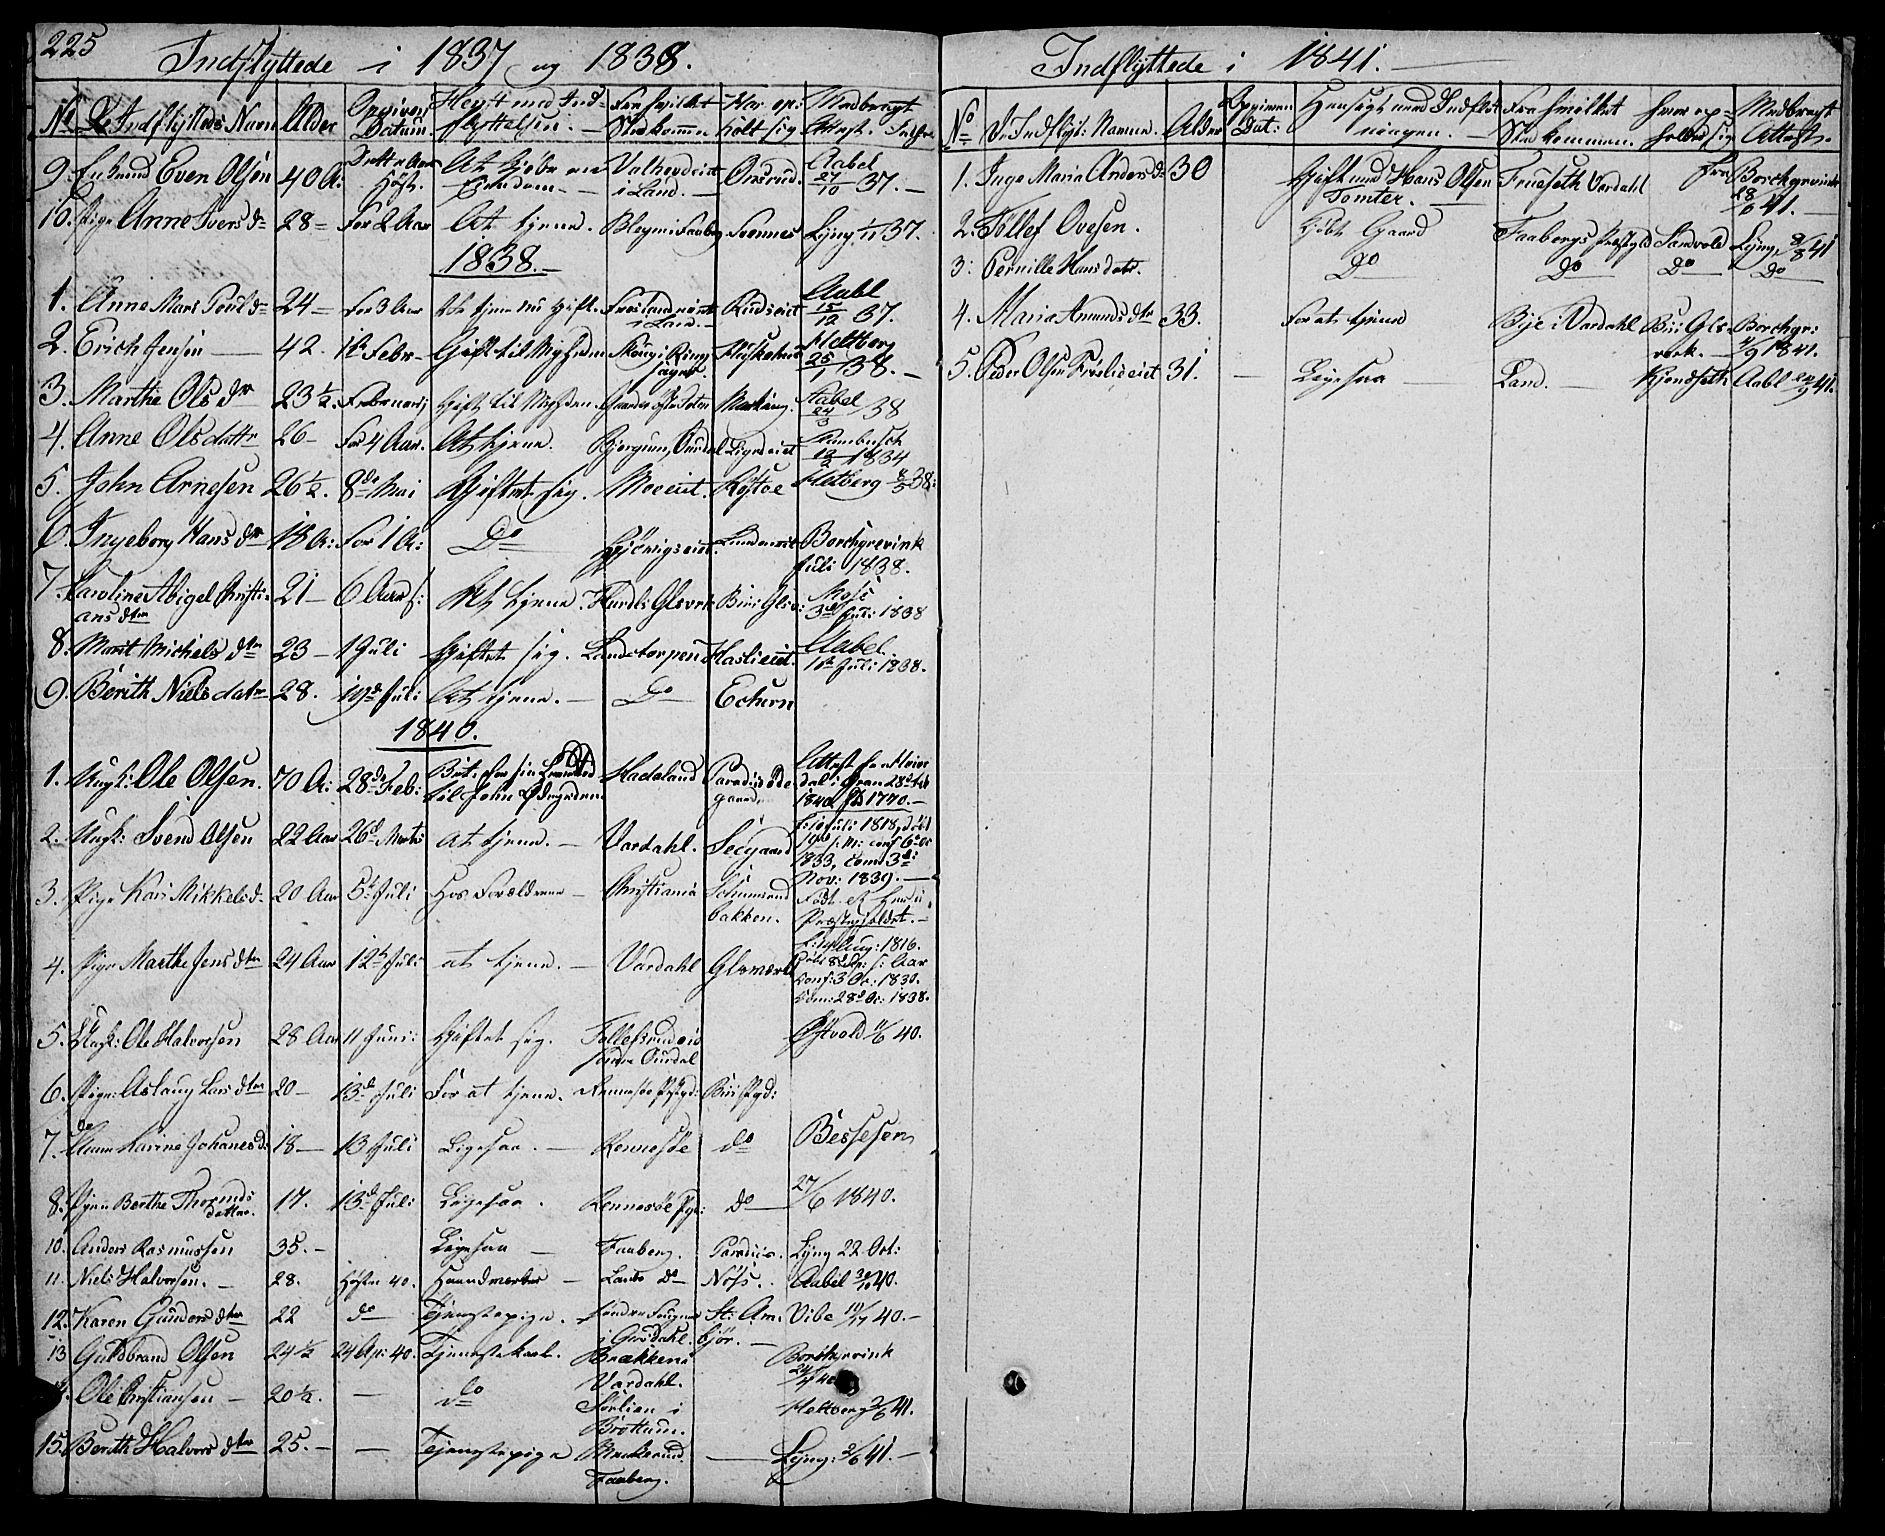 SAH, Biri prestekontor, Klokkerbok nr. 2, 1828-1842, s. 225